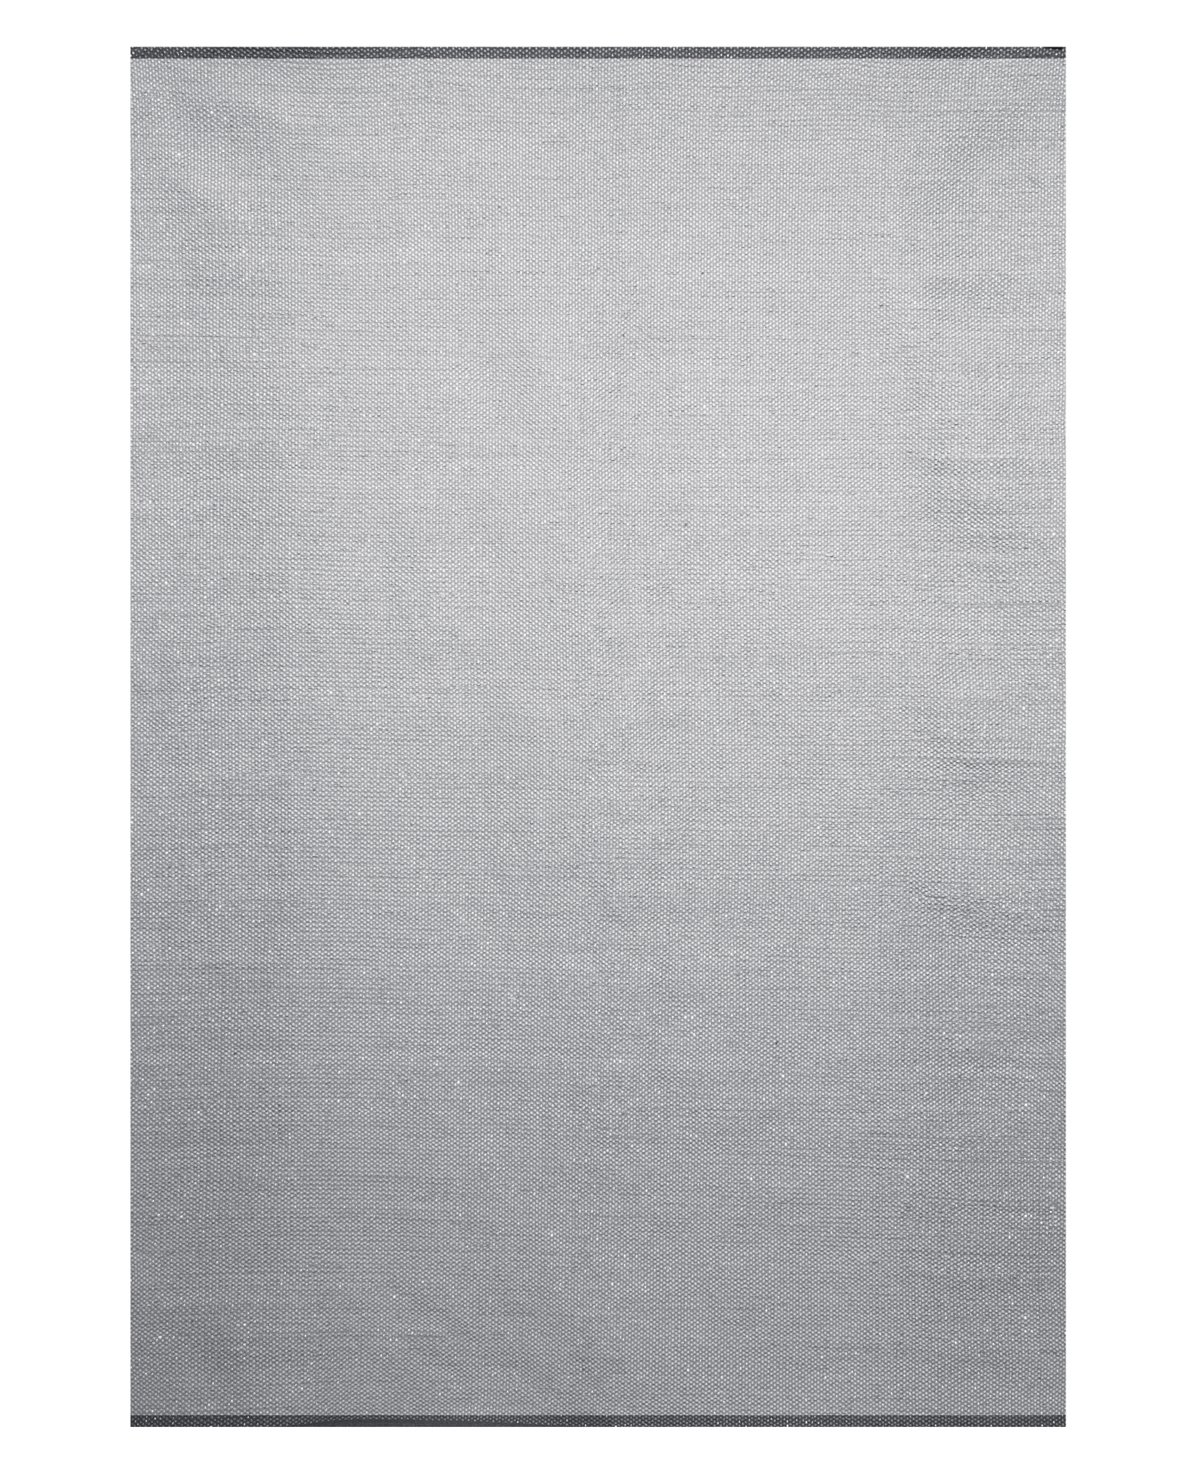 Sparkle White Poly Blend 8x10 Area Rug